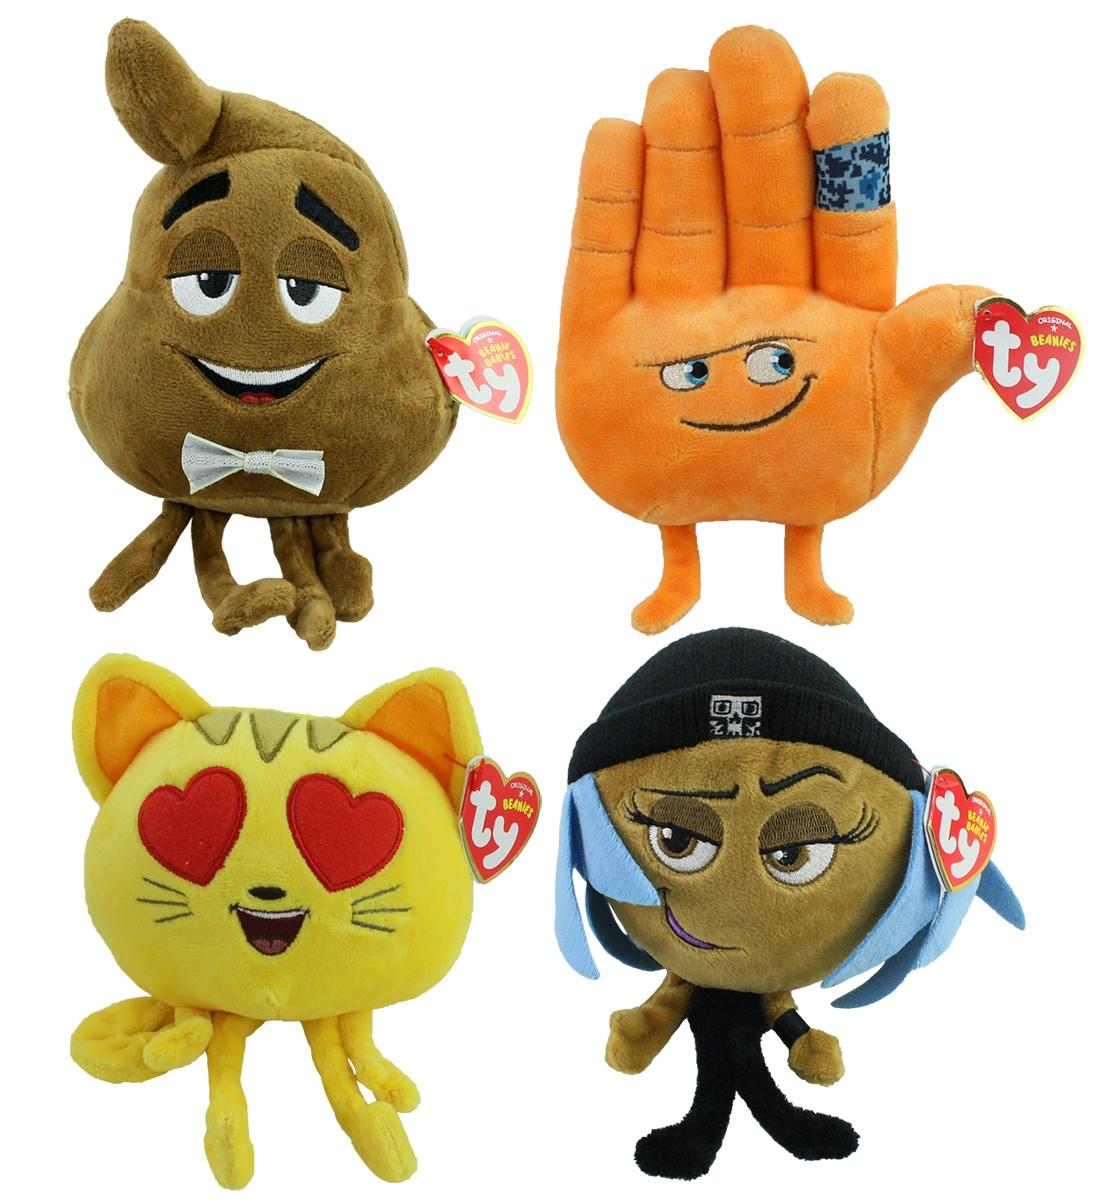 Carletto Emoji Set Ausbrecher, Kothaufen,Katze,High5